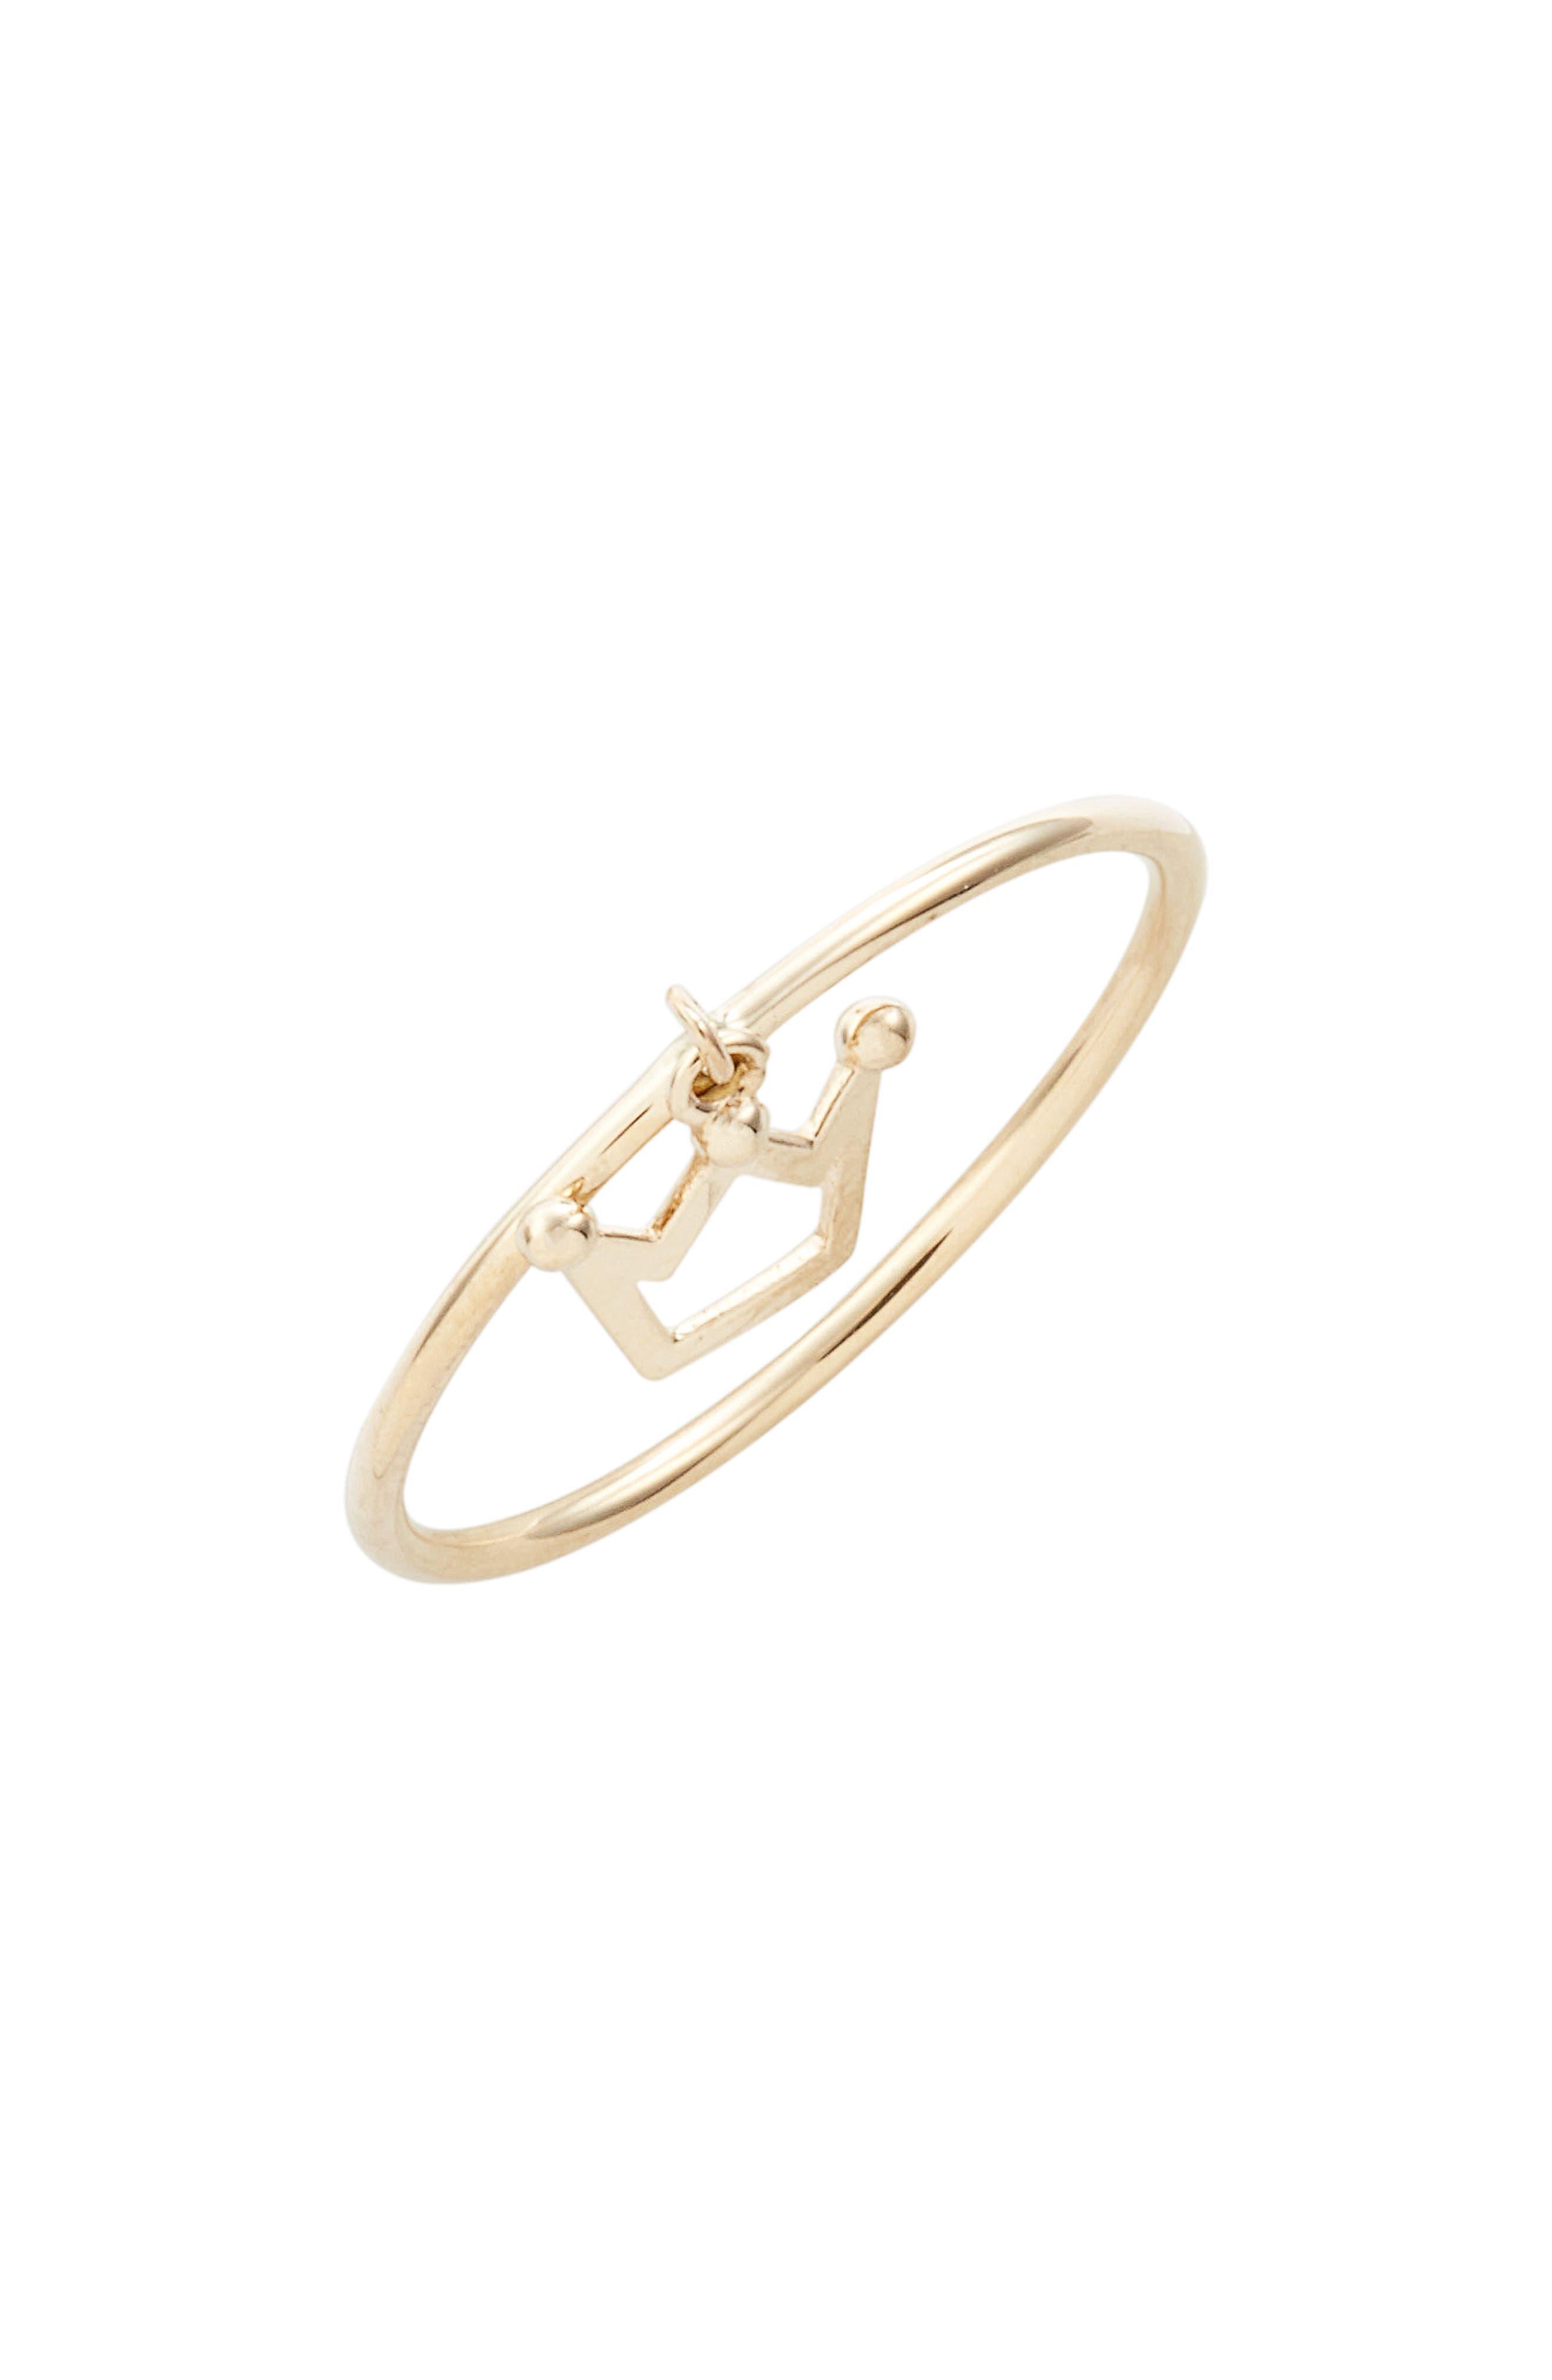 POPPY FINCH Skinny Dangling Crown Charm Ring